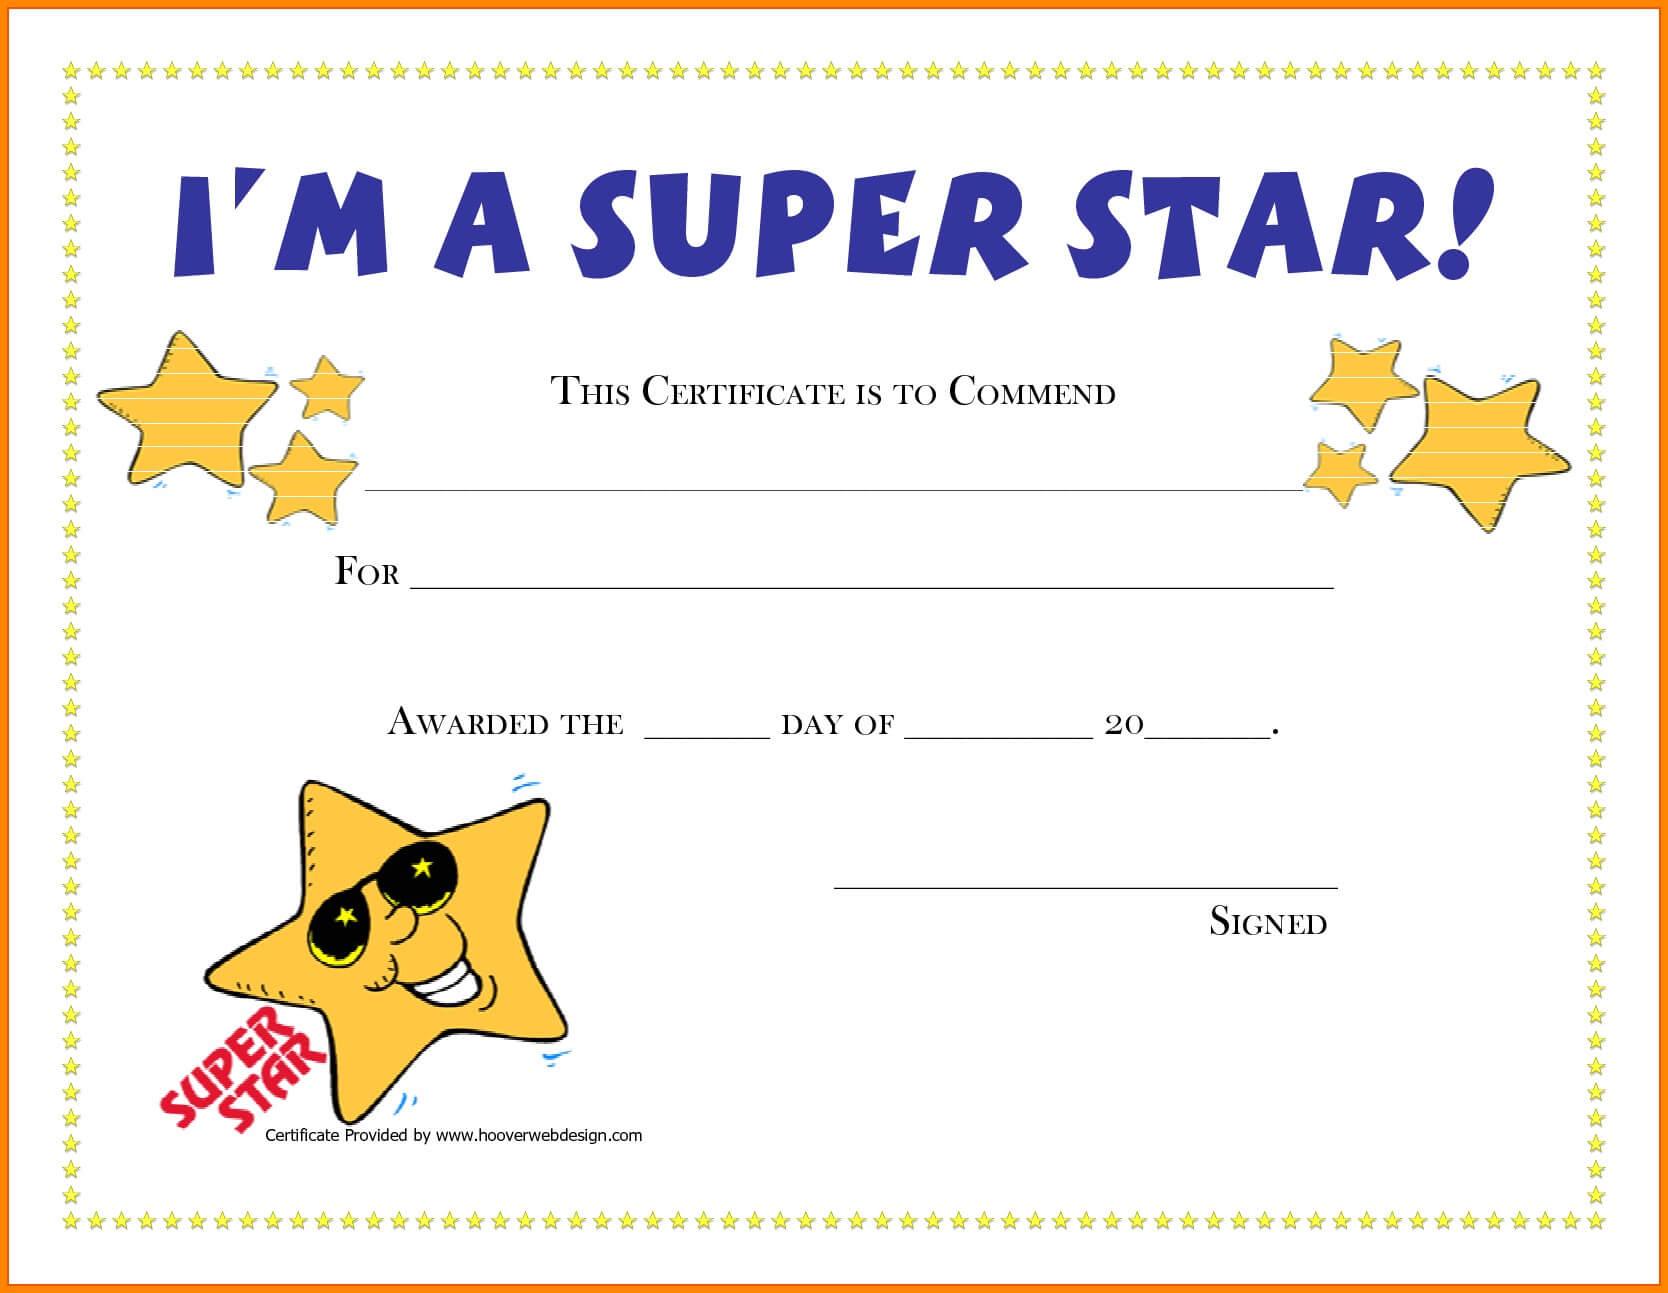 All Good Work Certificate Templates 7   Lovlyangels For Good Job Certificate Template